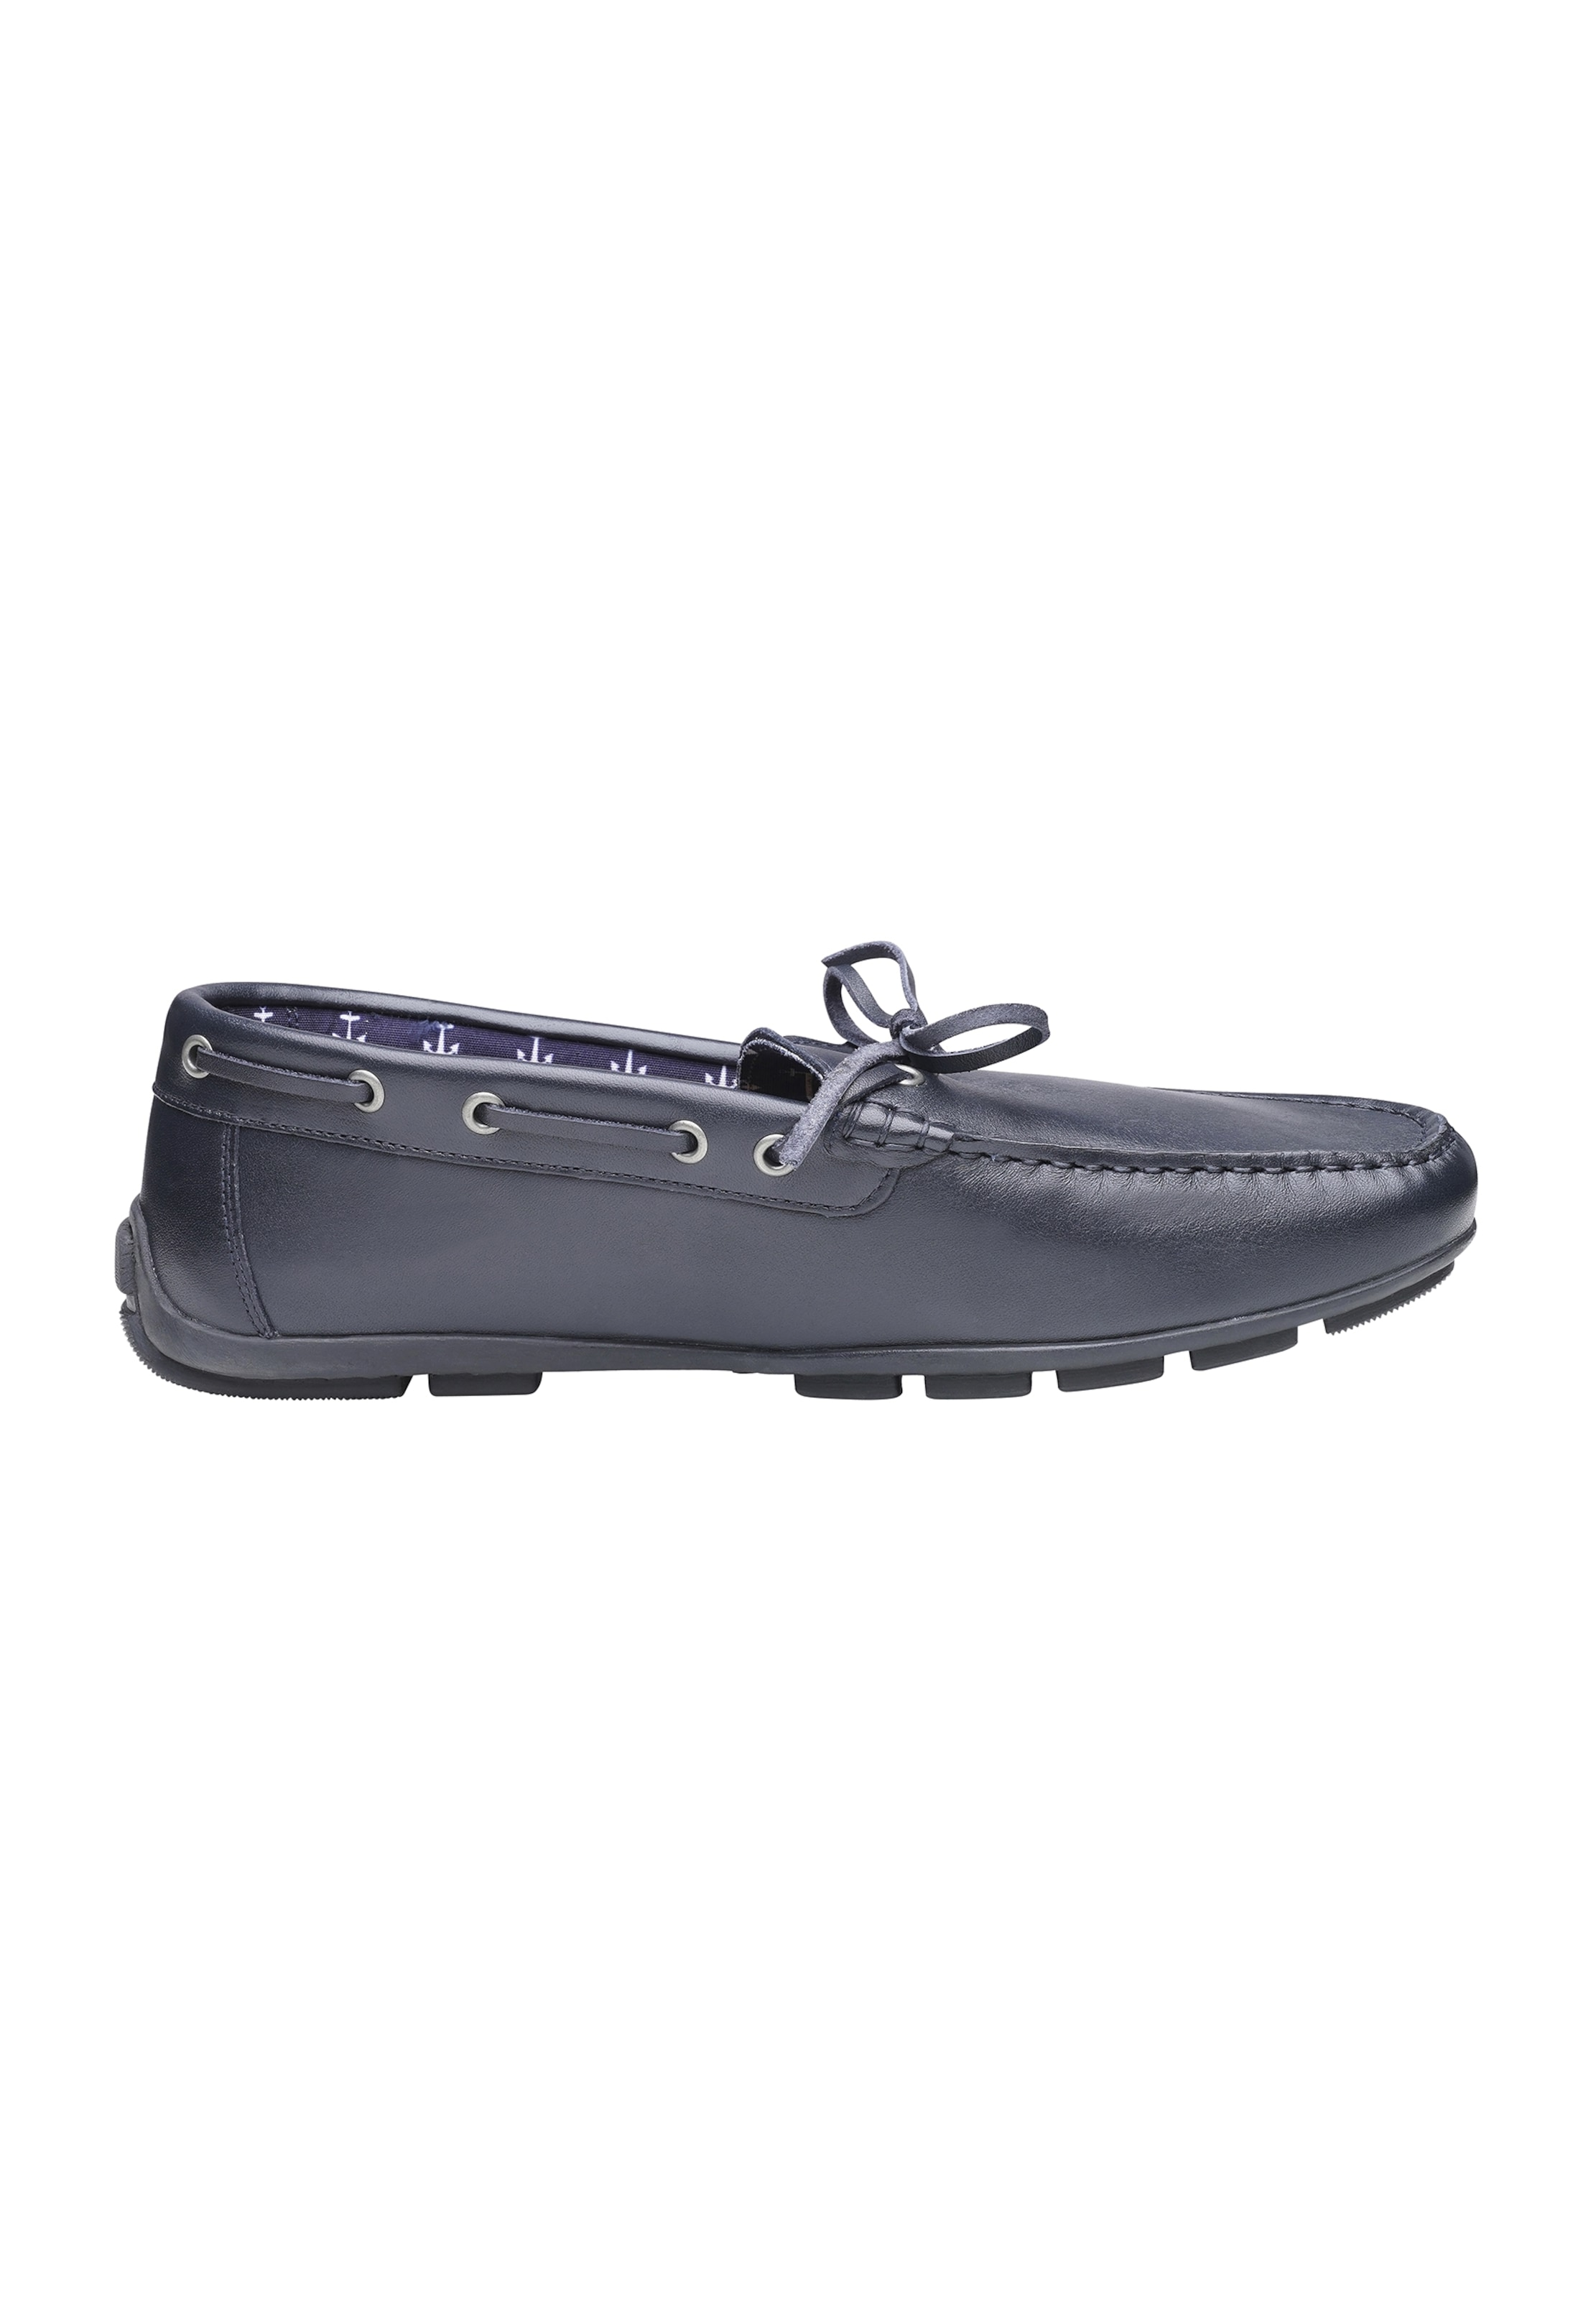 Nachtblau Mokassins Mm' Shoepassion 'no94 In w0OPnk